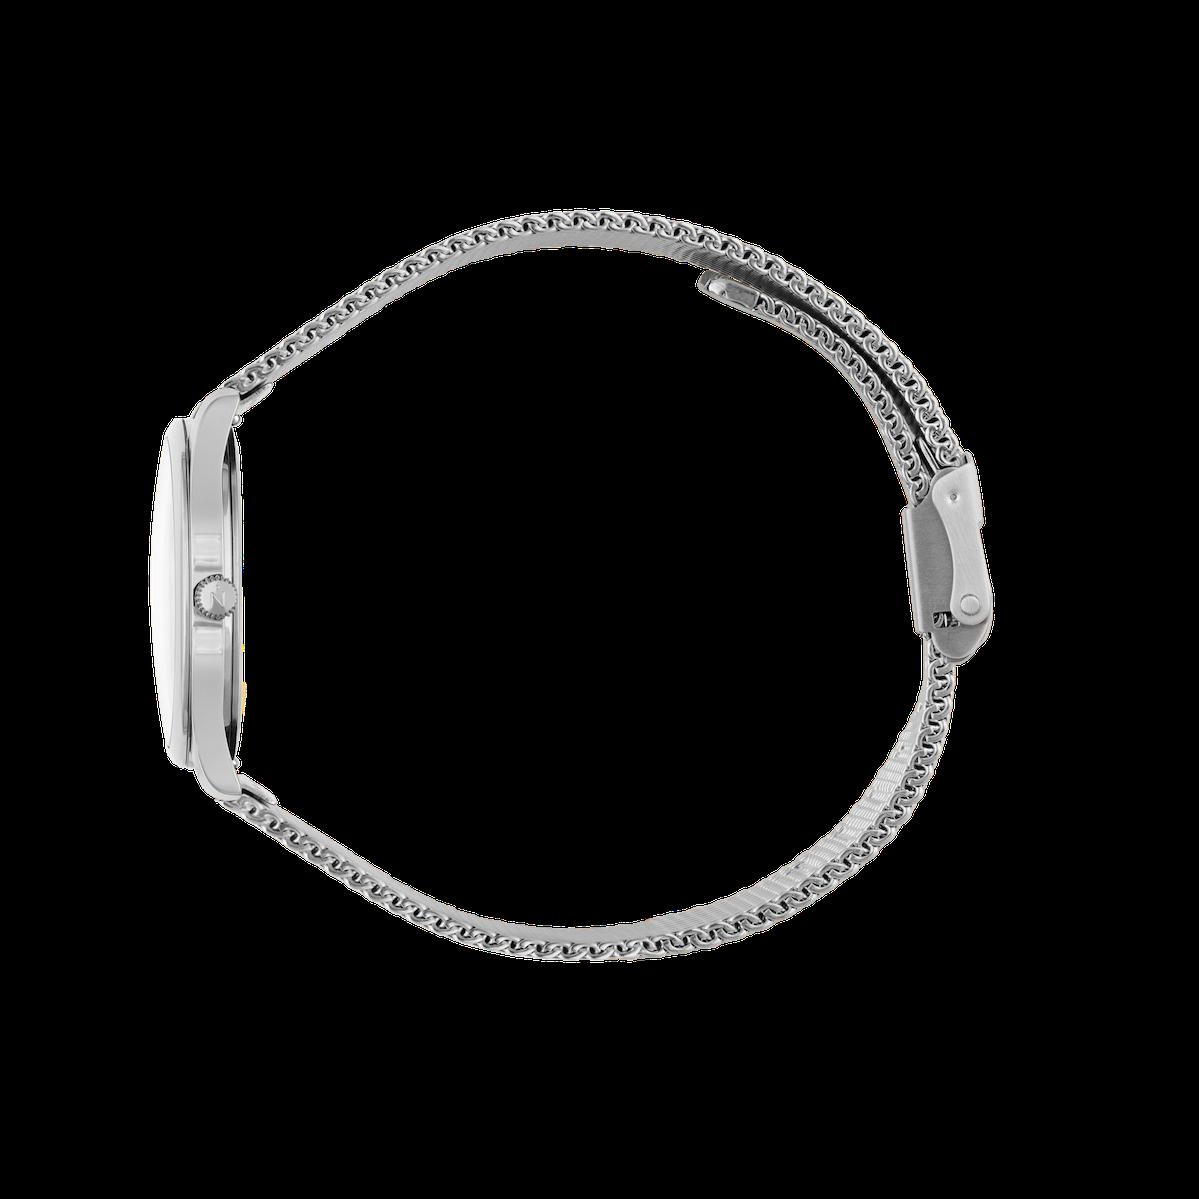 Mini Lune - Stainless Steel - Stainless Steel Mesh